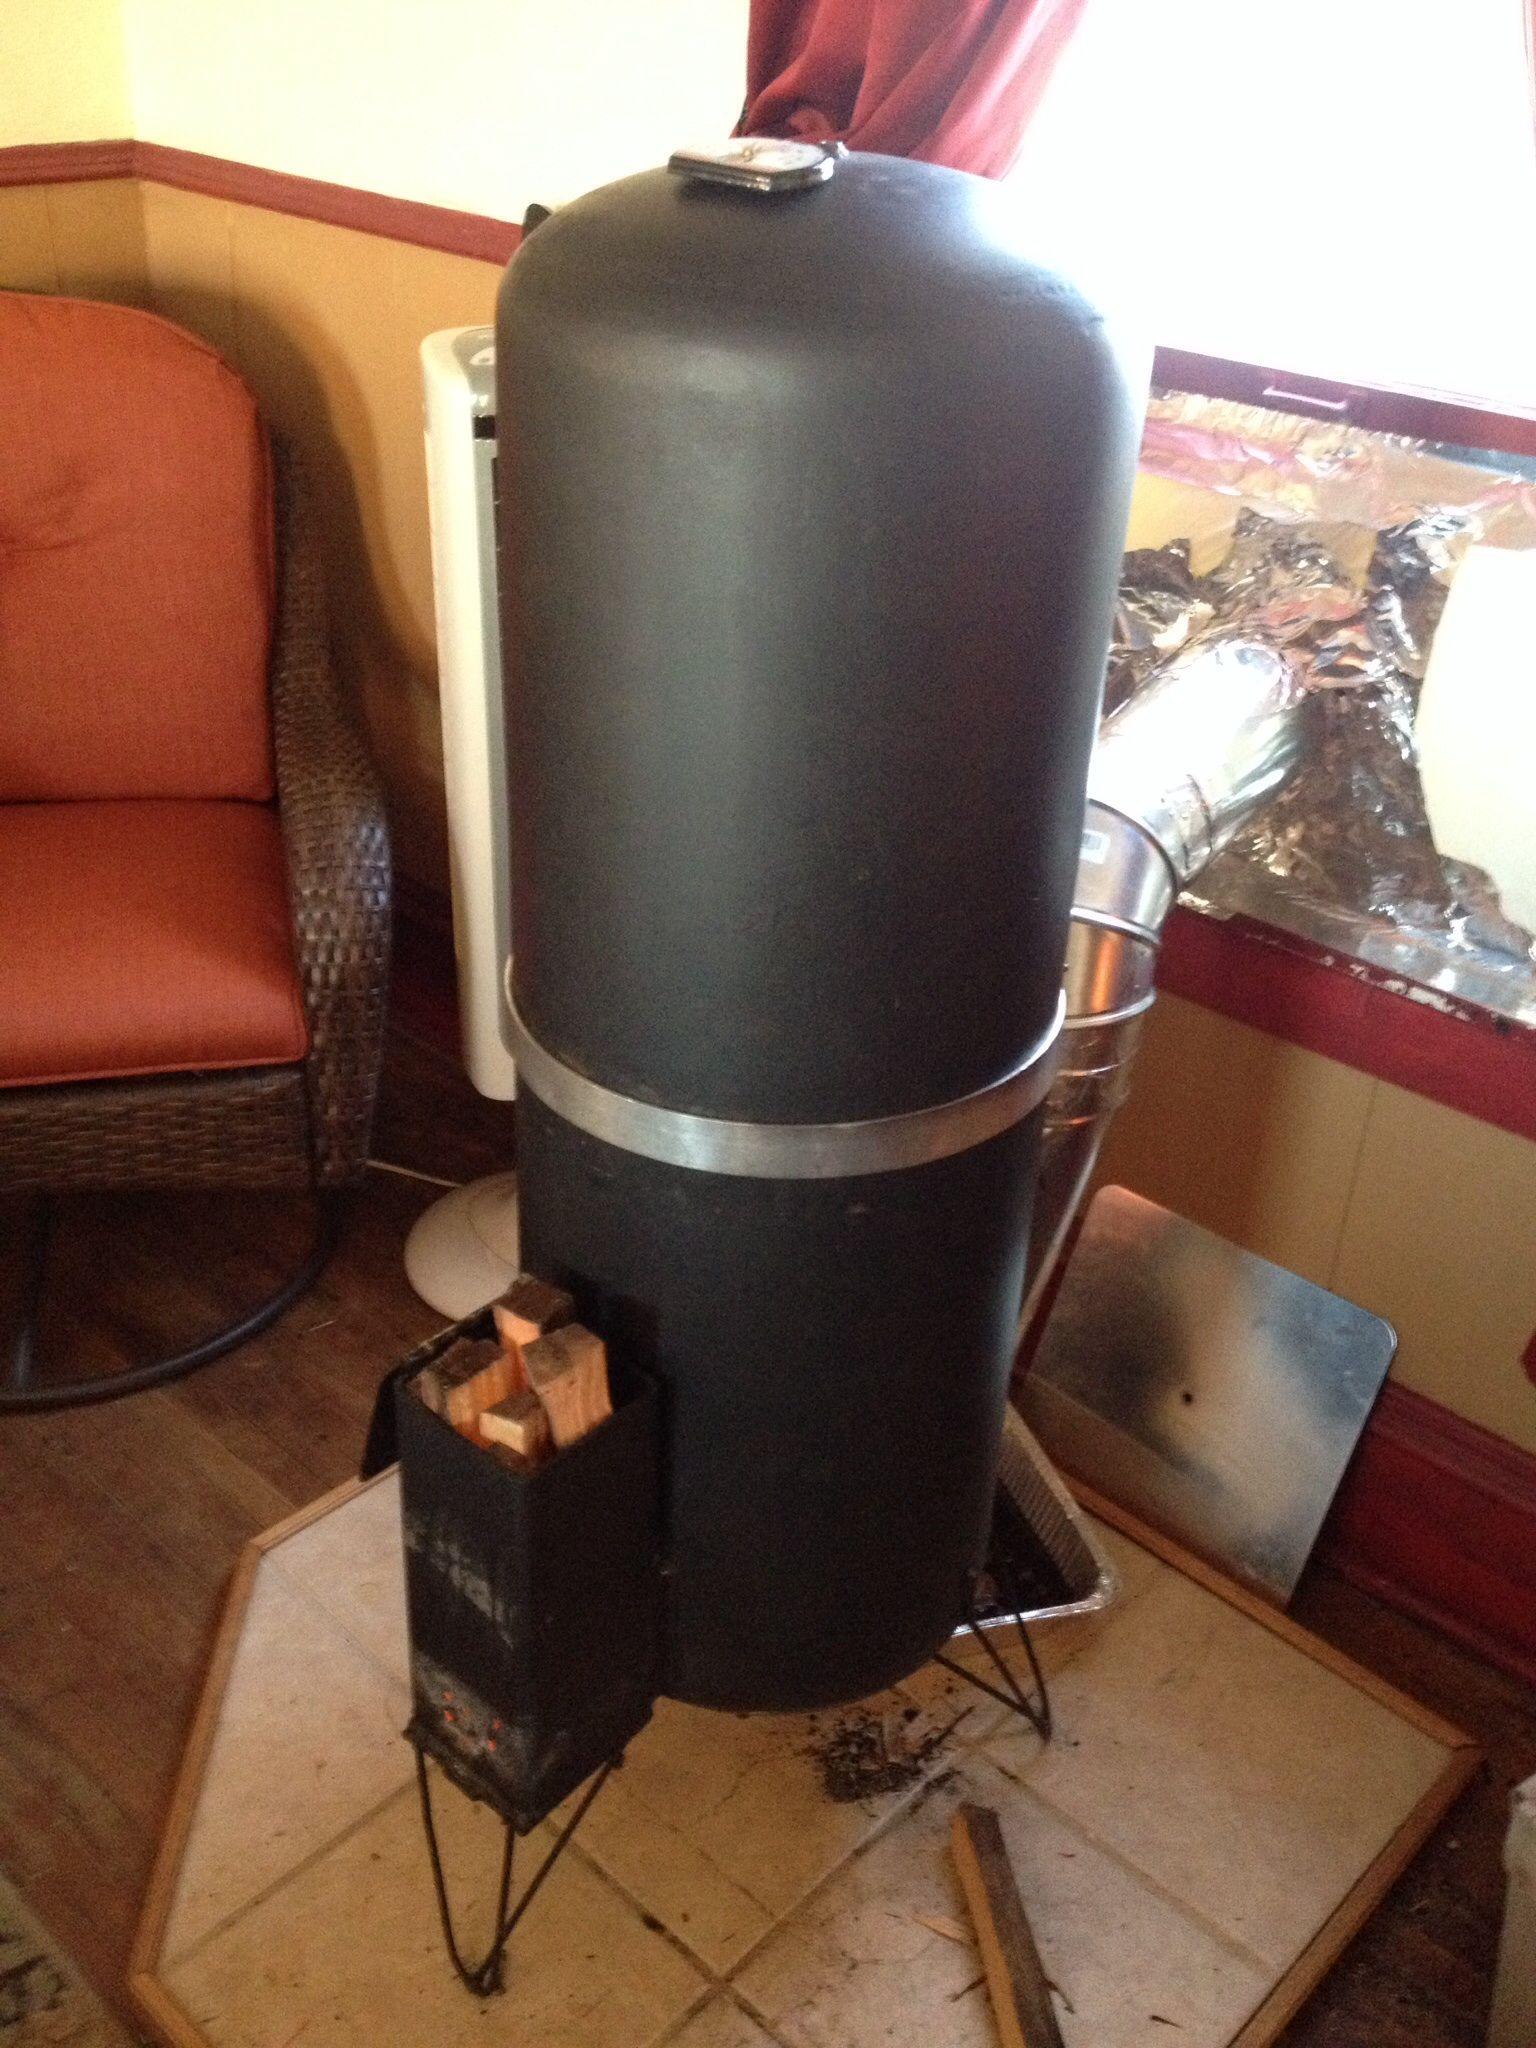 Rocket Stove Rocket Stoves Rocket Mass Heater Stove Heater